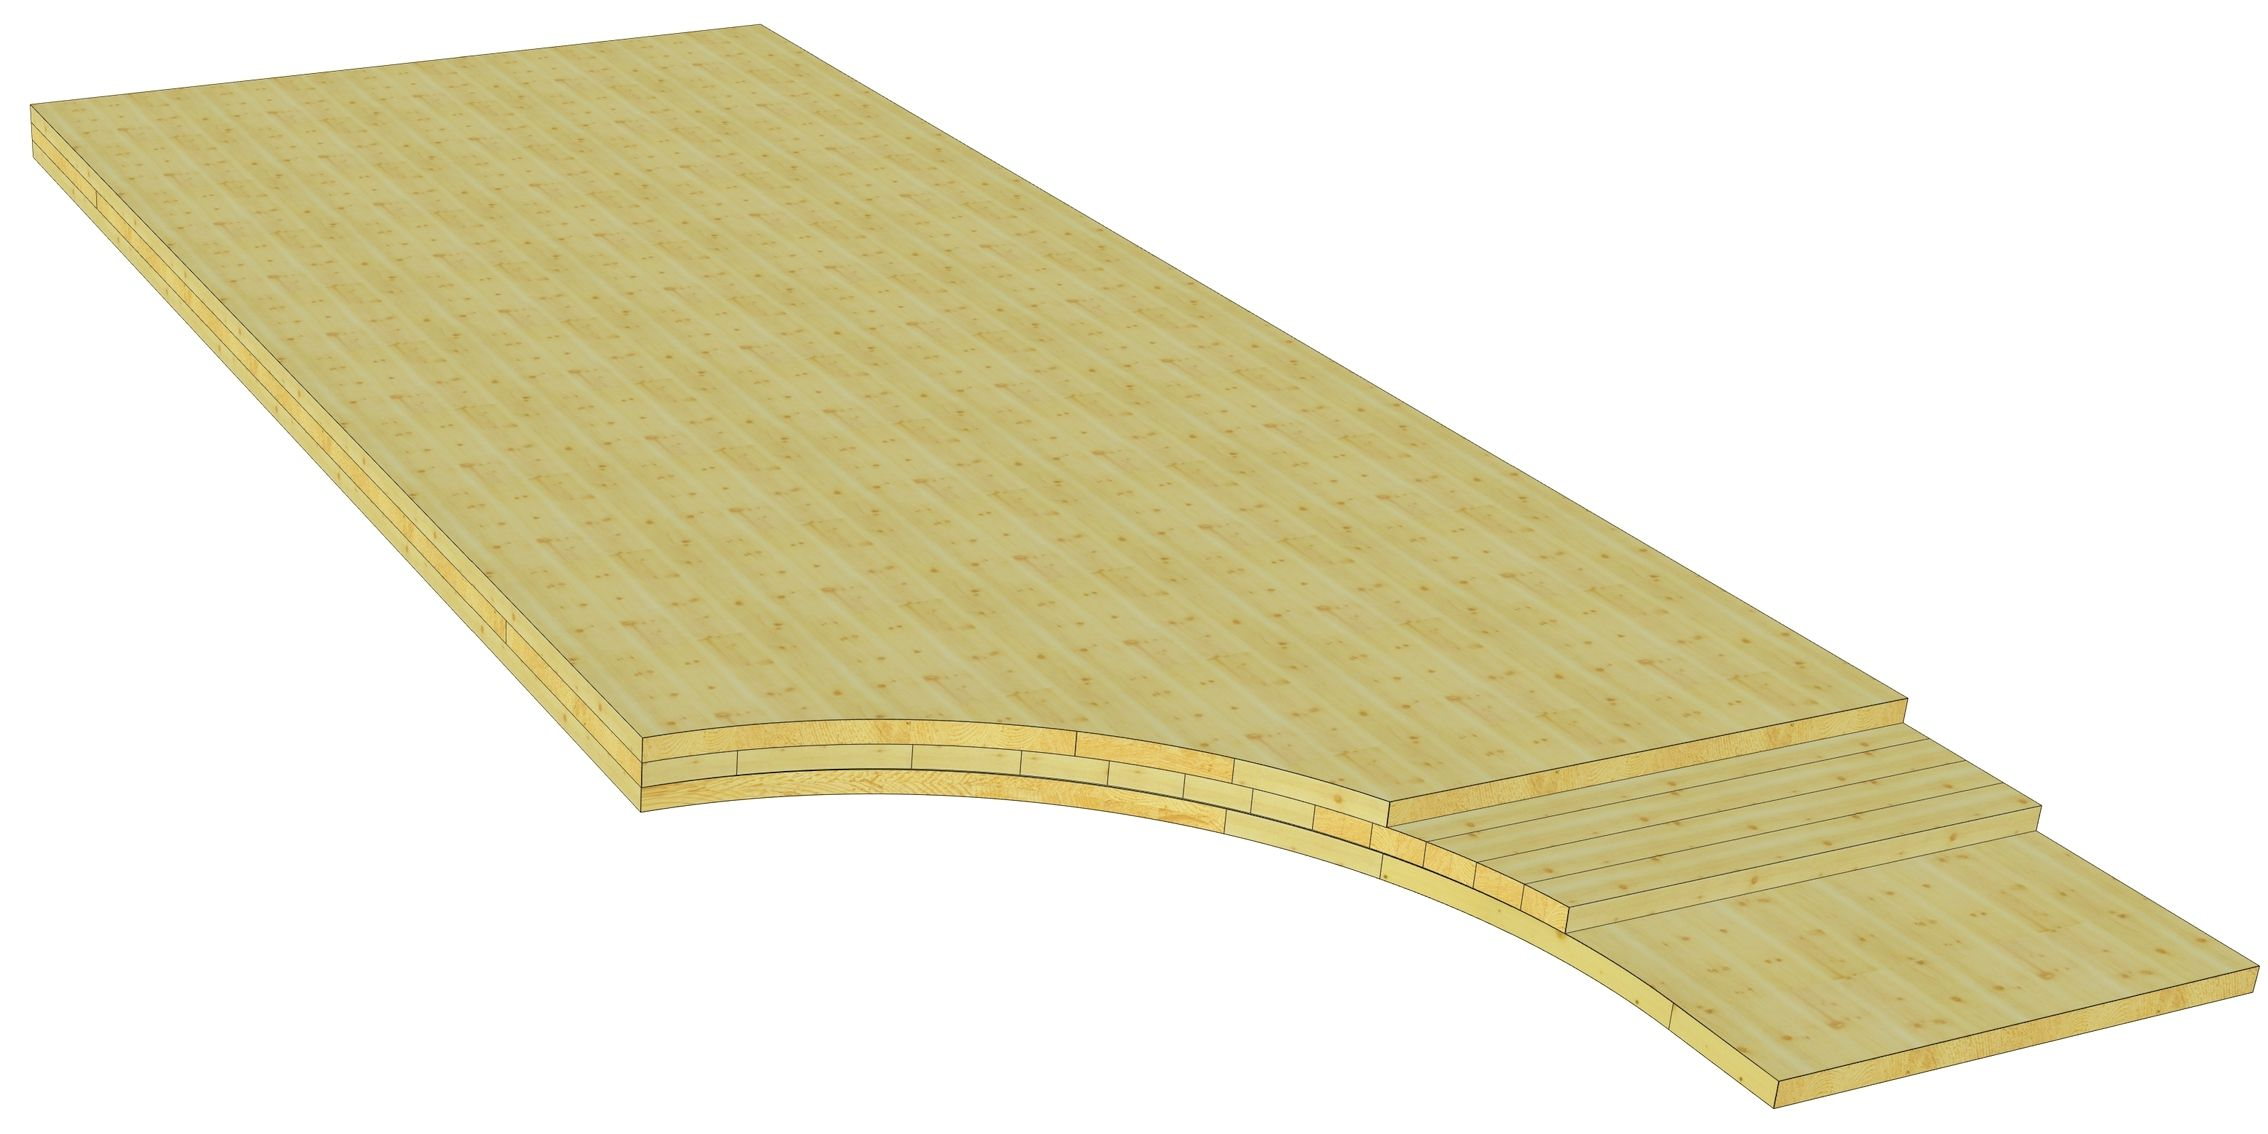 Cross laminated timber CLT